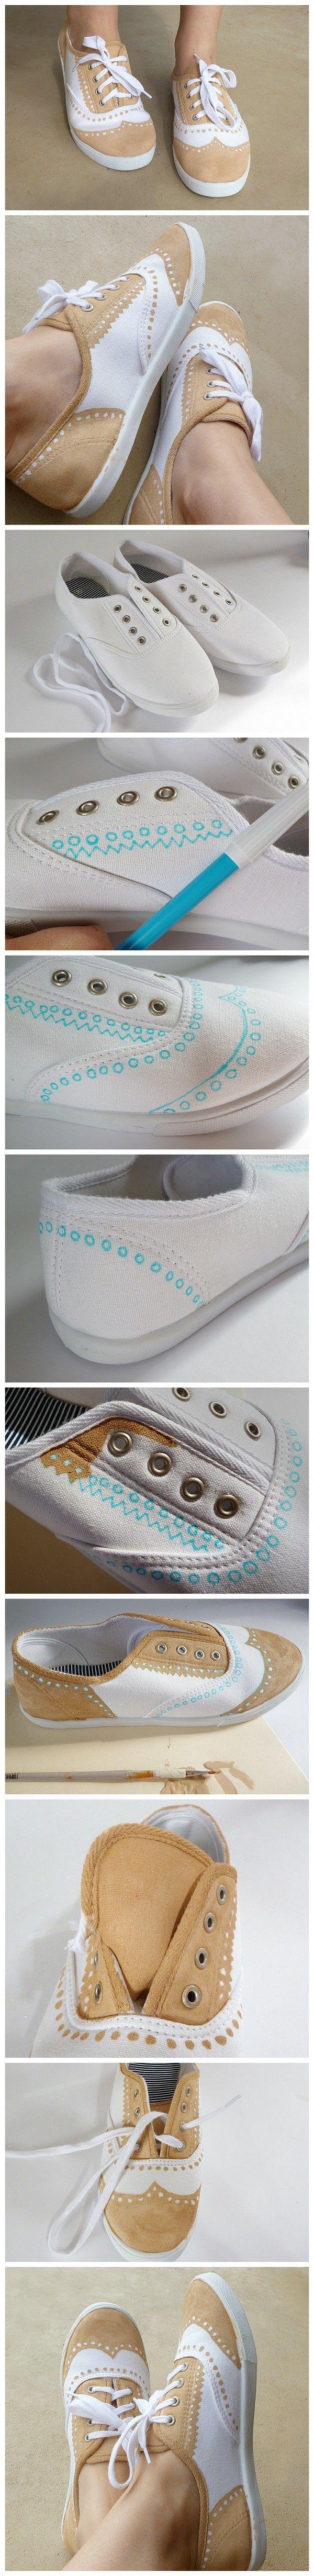 zapatillas tuneadas muy ingenioso